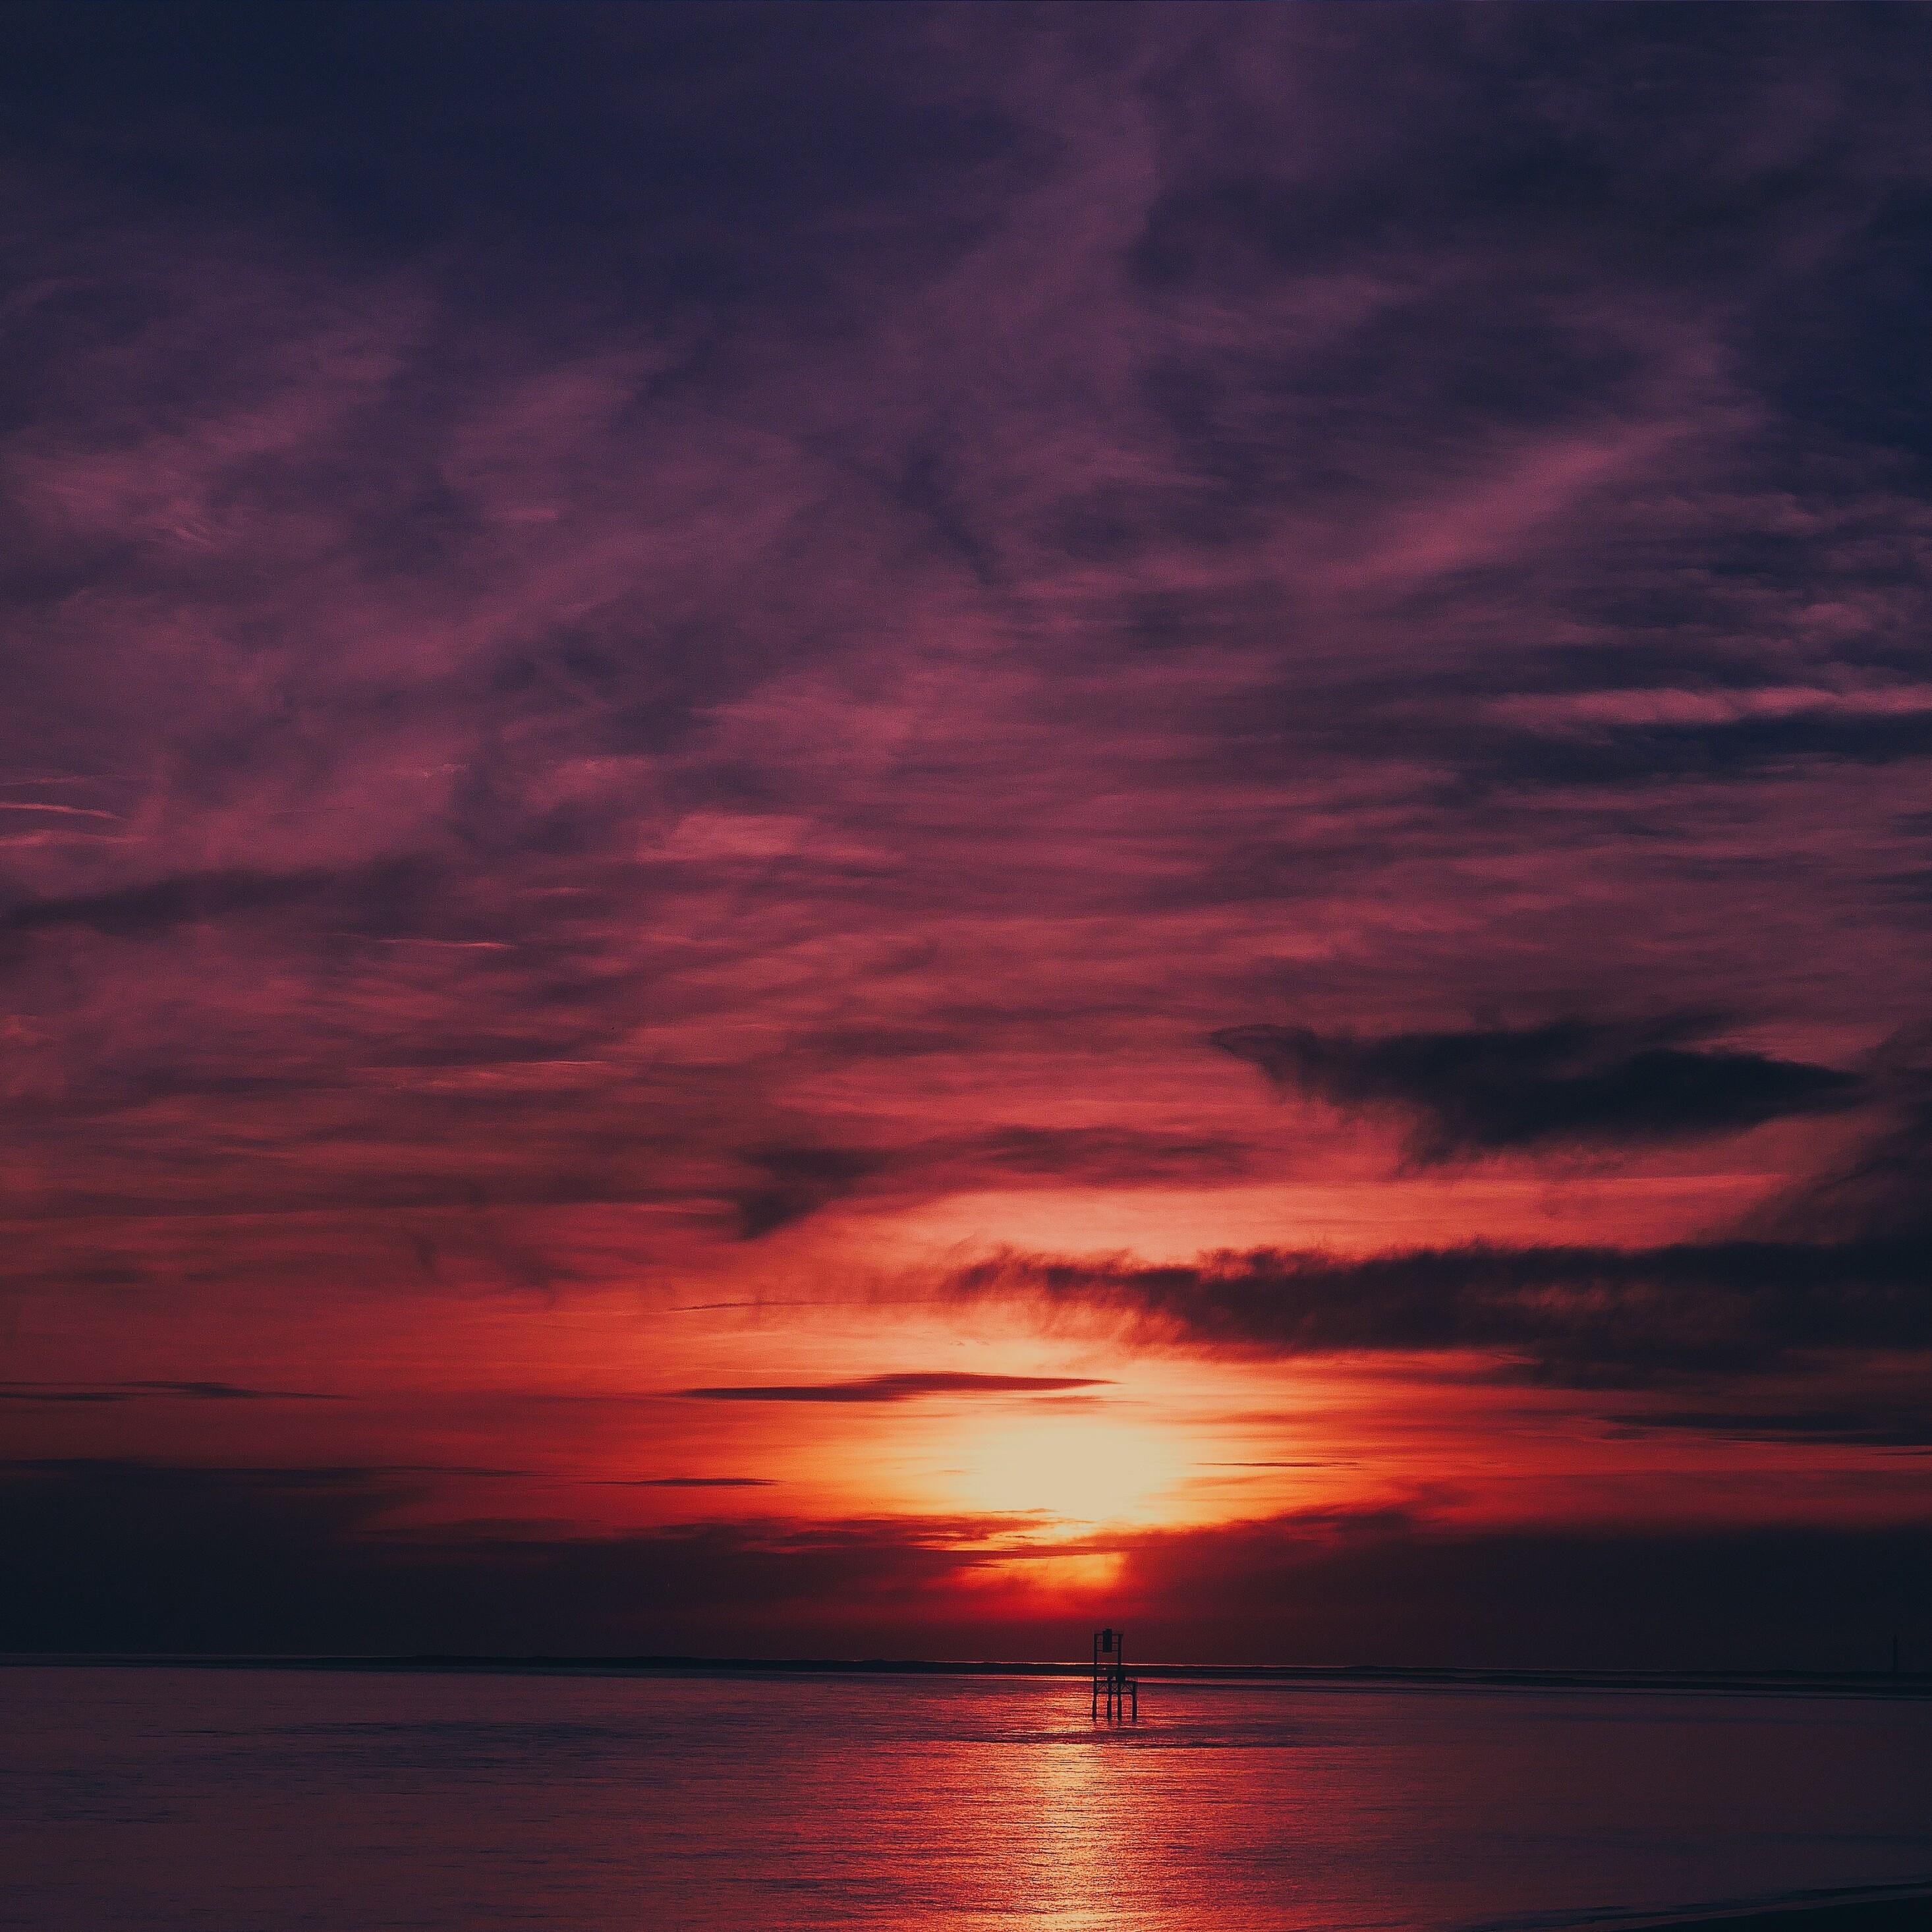 sky-sea-flares-sunset-water-reflection-4k-0w.jpg